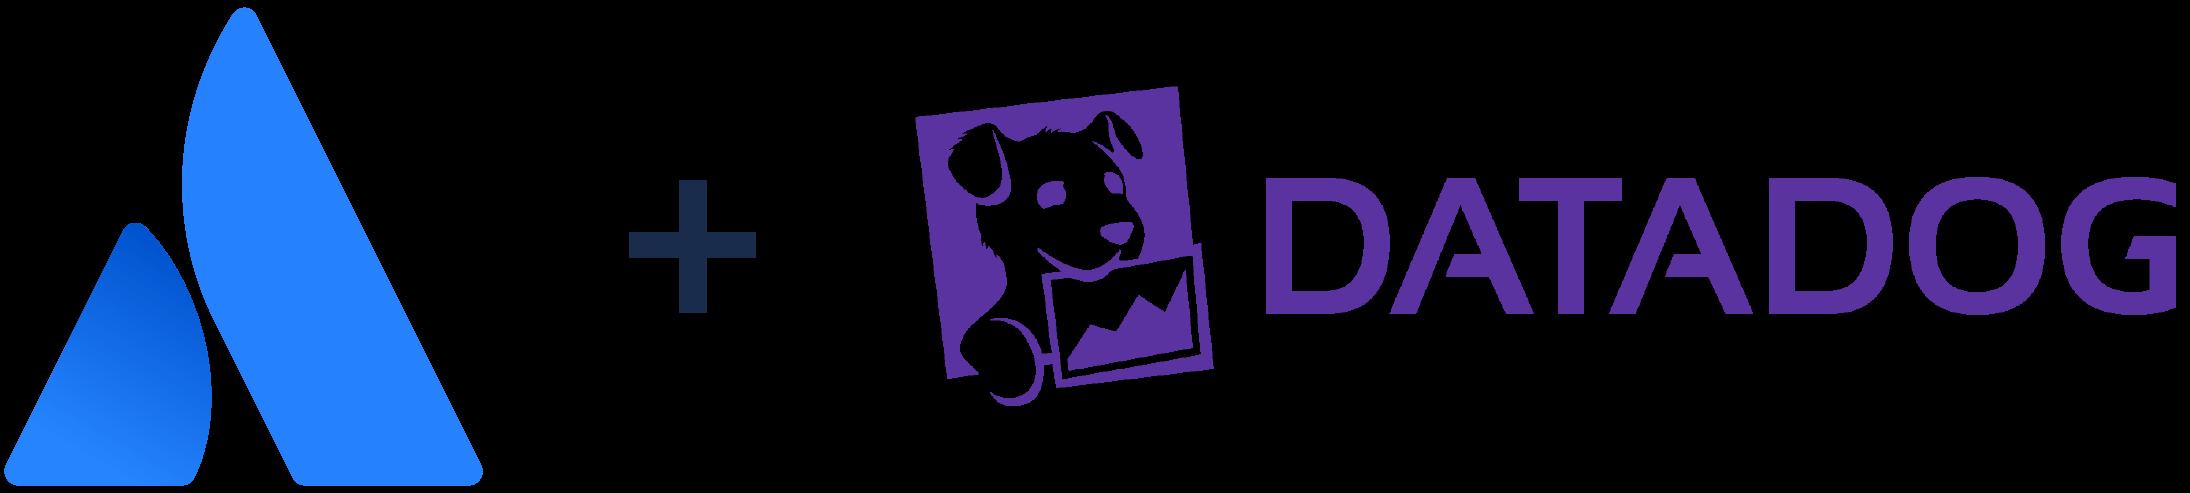 Atlassian logo + Datadog logo